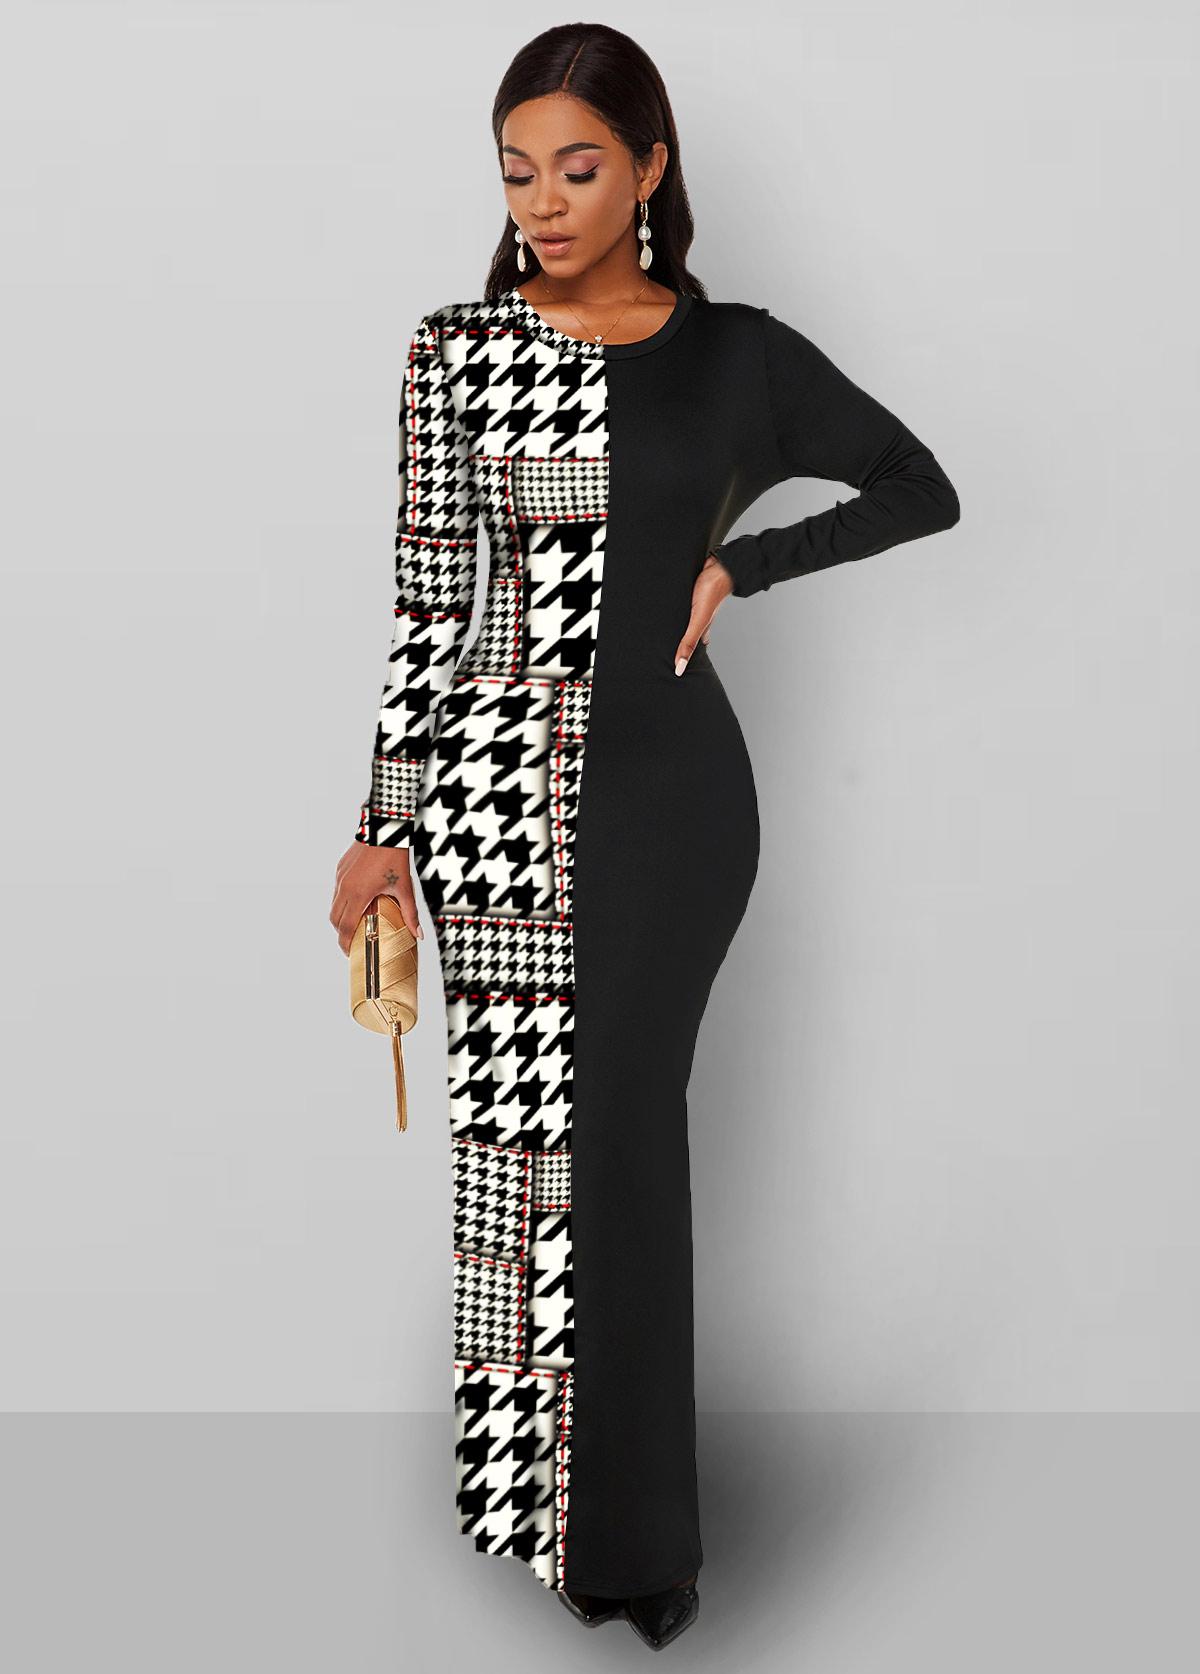 Houndstooth Print Long Sleeve Round Neck Dress